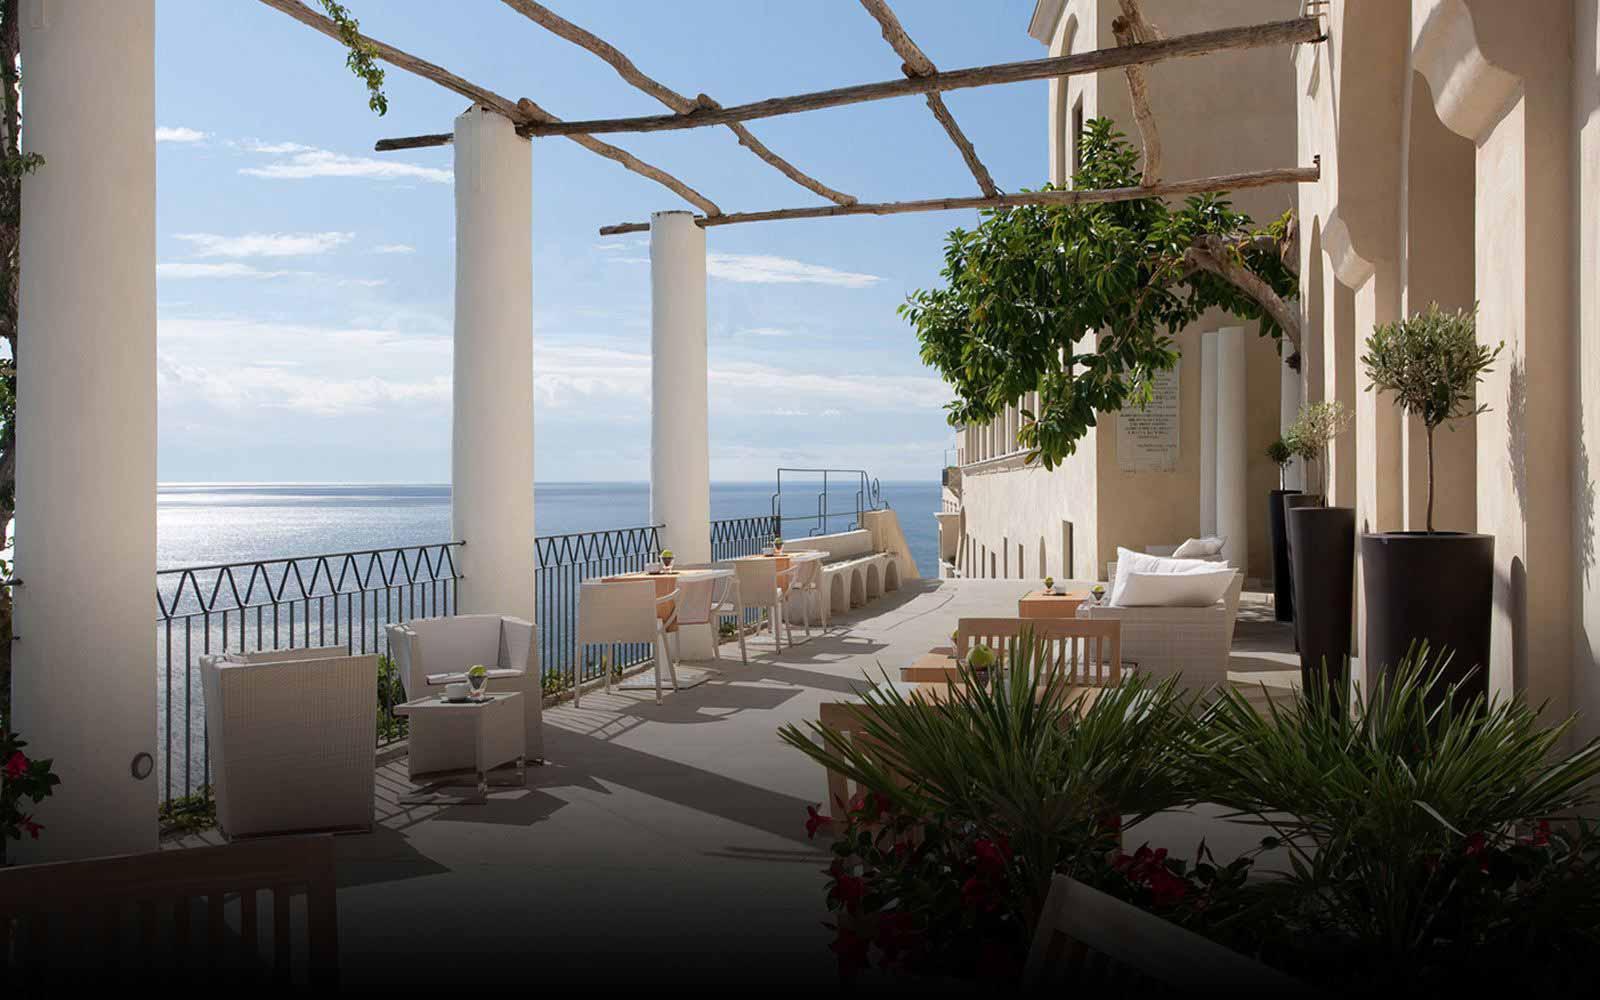 Terrace at NH Collection Grand Hotel Convento di Amalfi